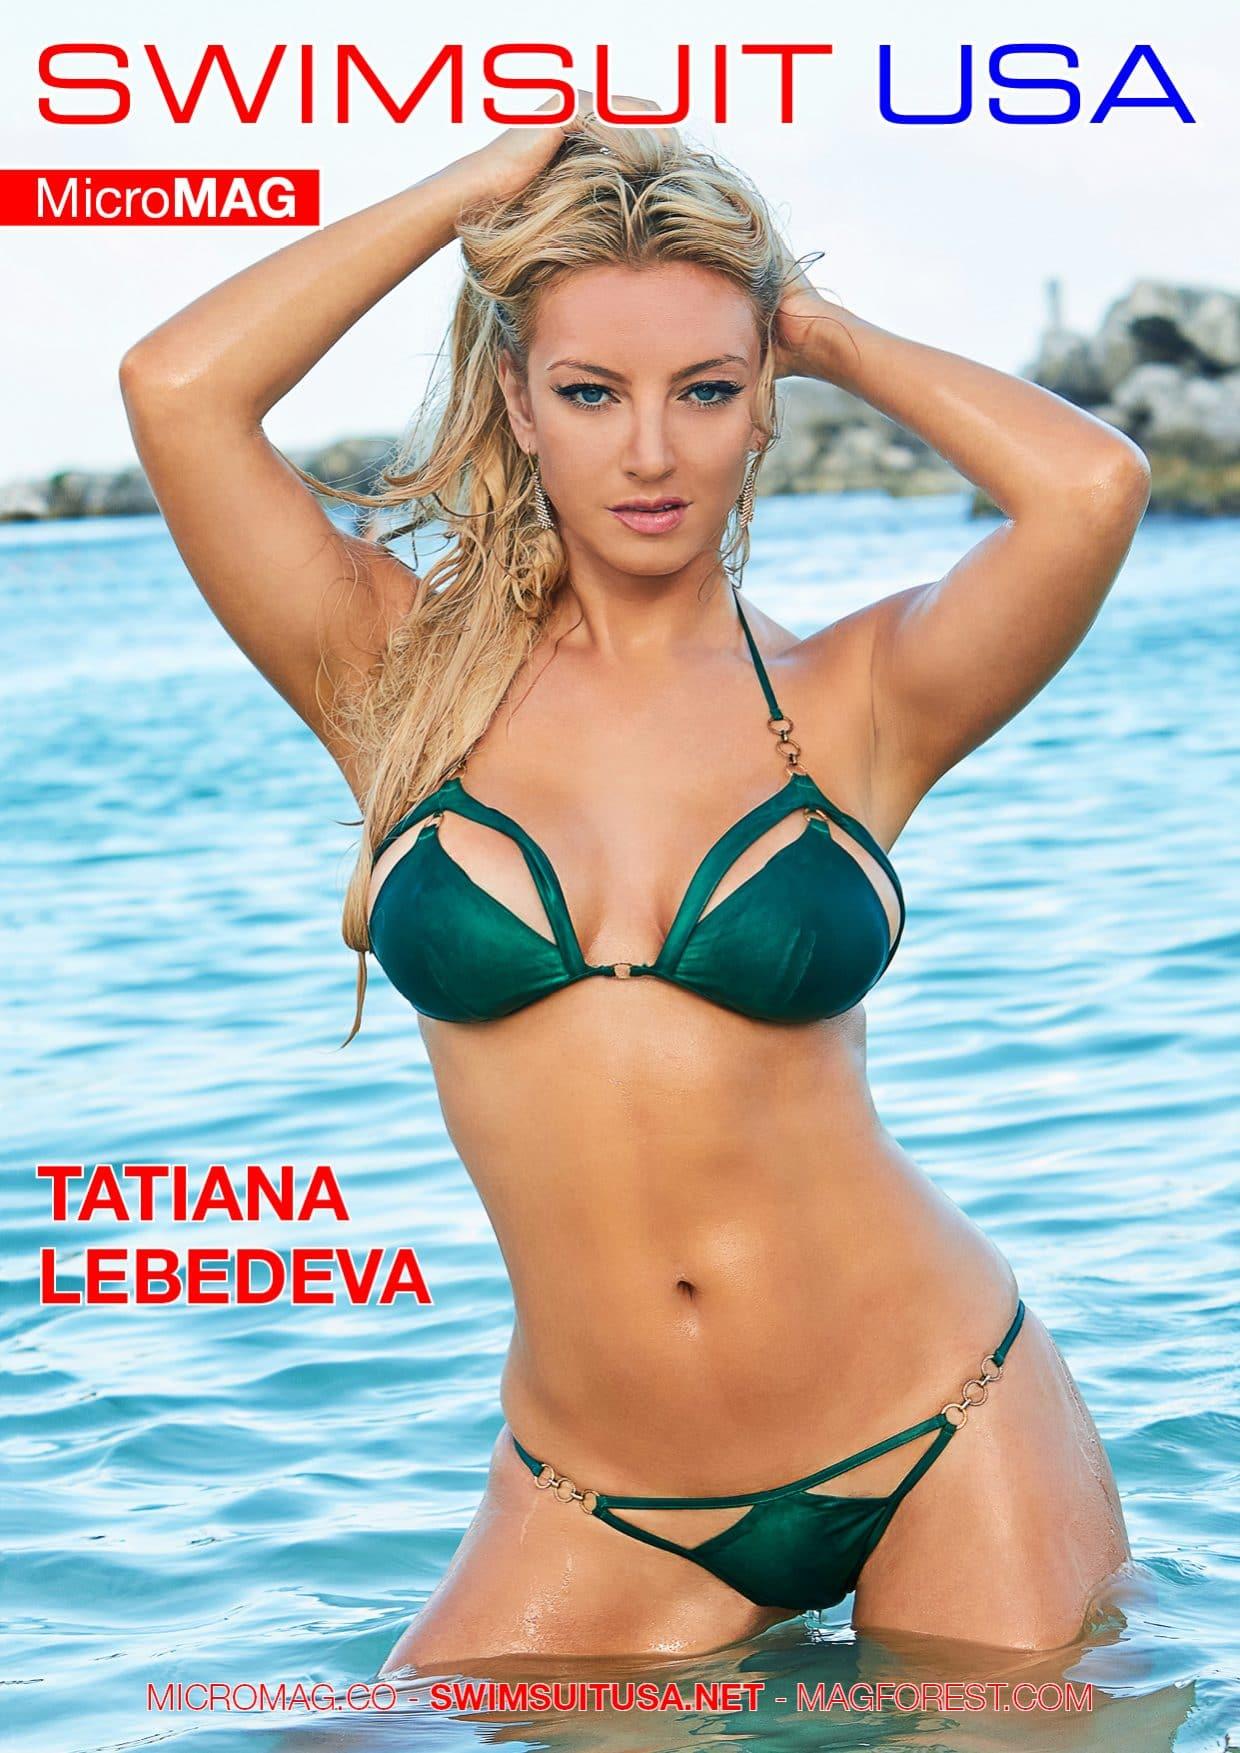 Swimsuit USA MicroMAG - Tatiana Lebedeva 1